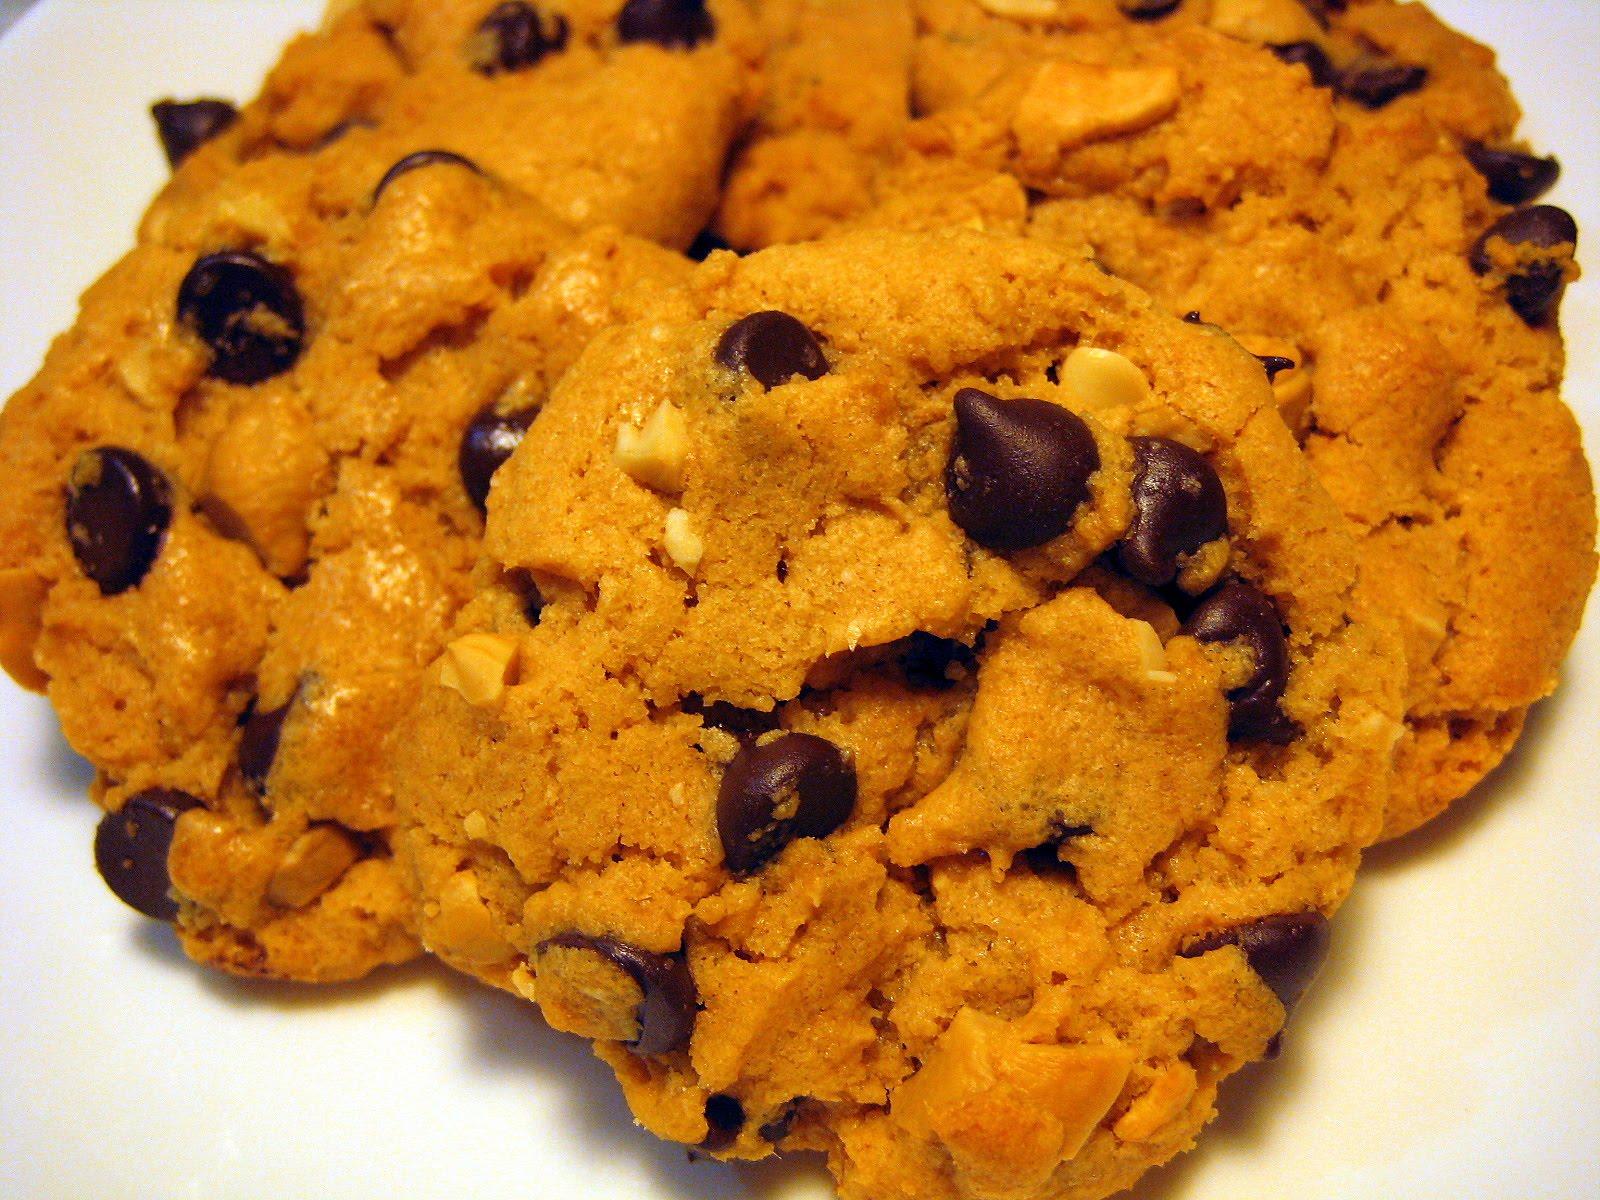 ... Matt Categories: Baked goods , Chocolate recipes , Desserts/Cookies